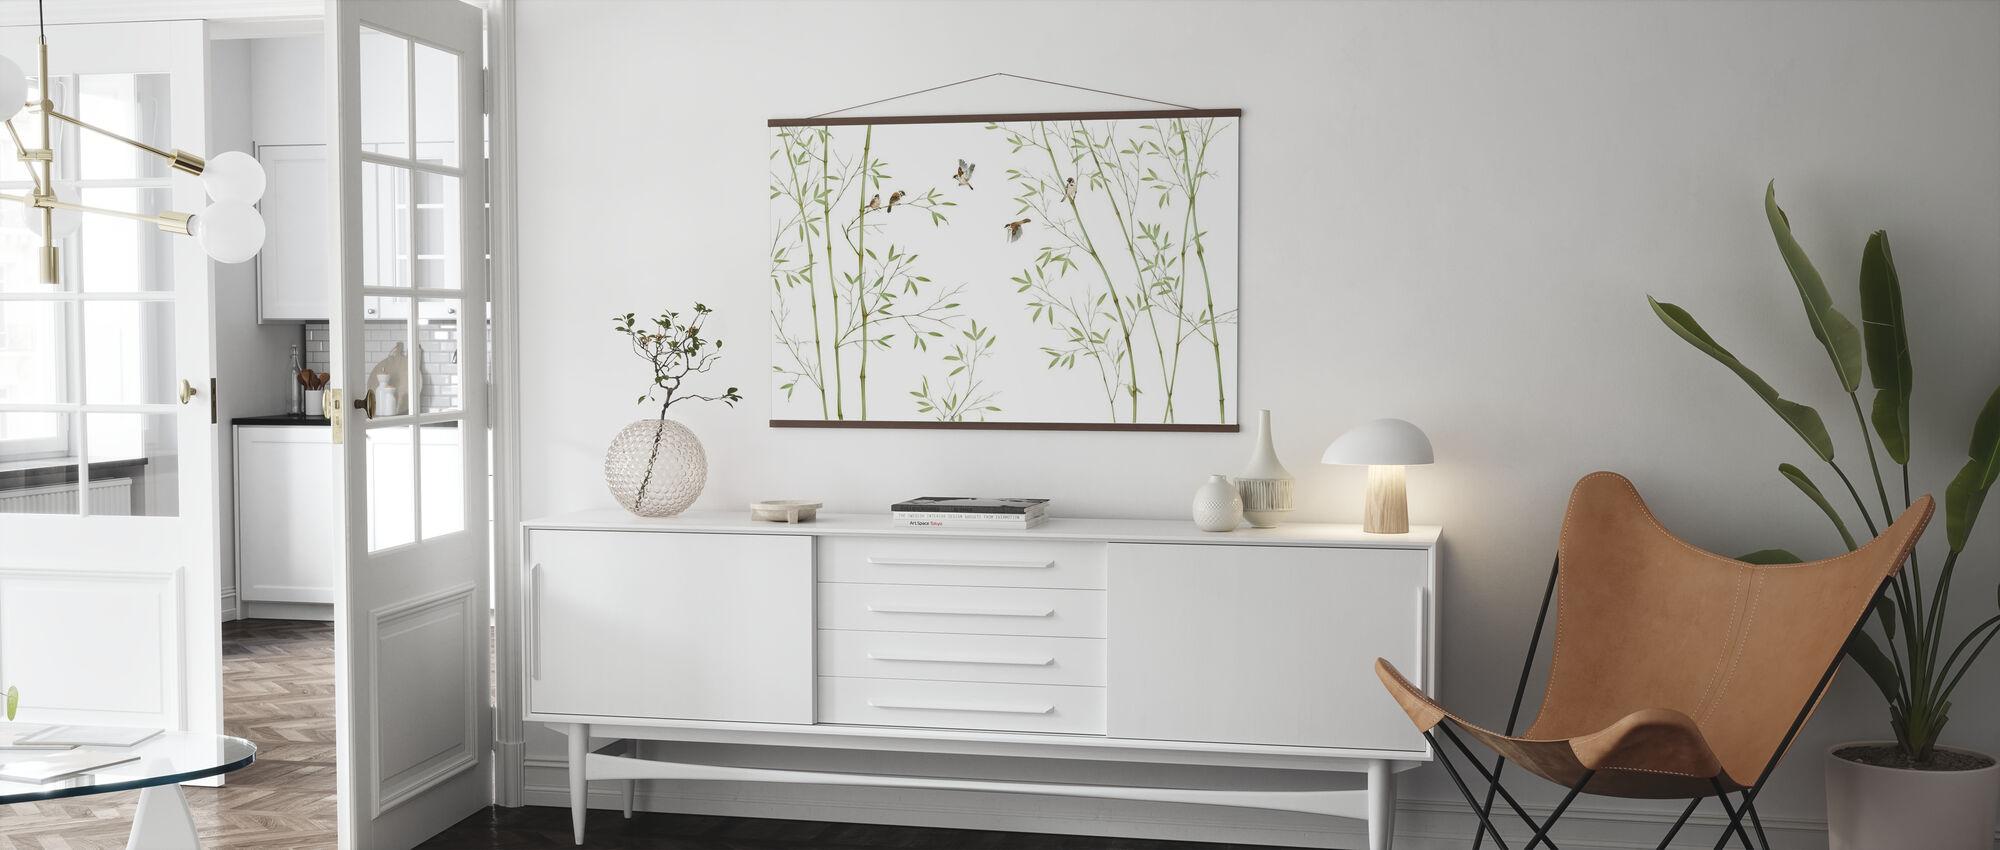 Bamboo Birds - Poster - Living Room